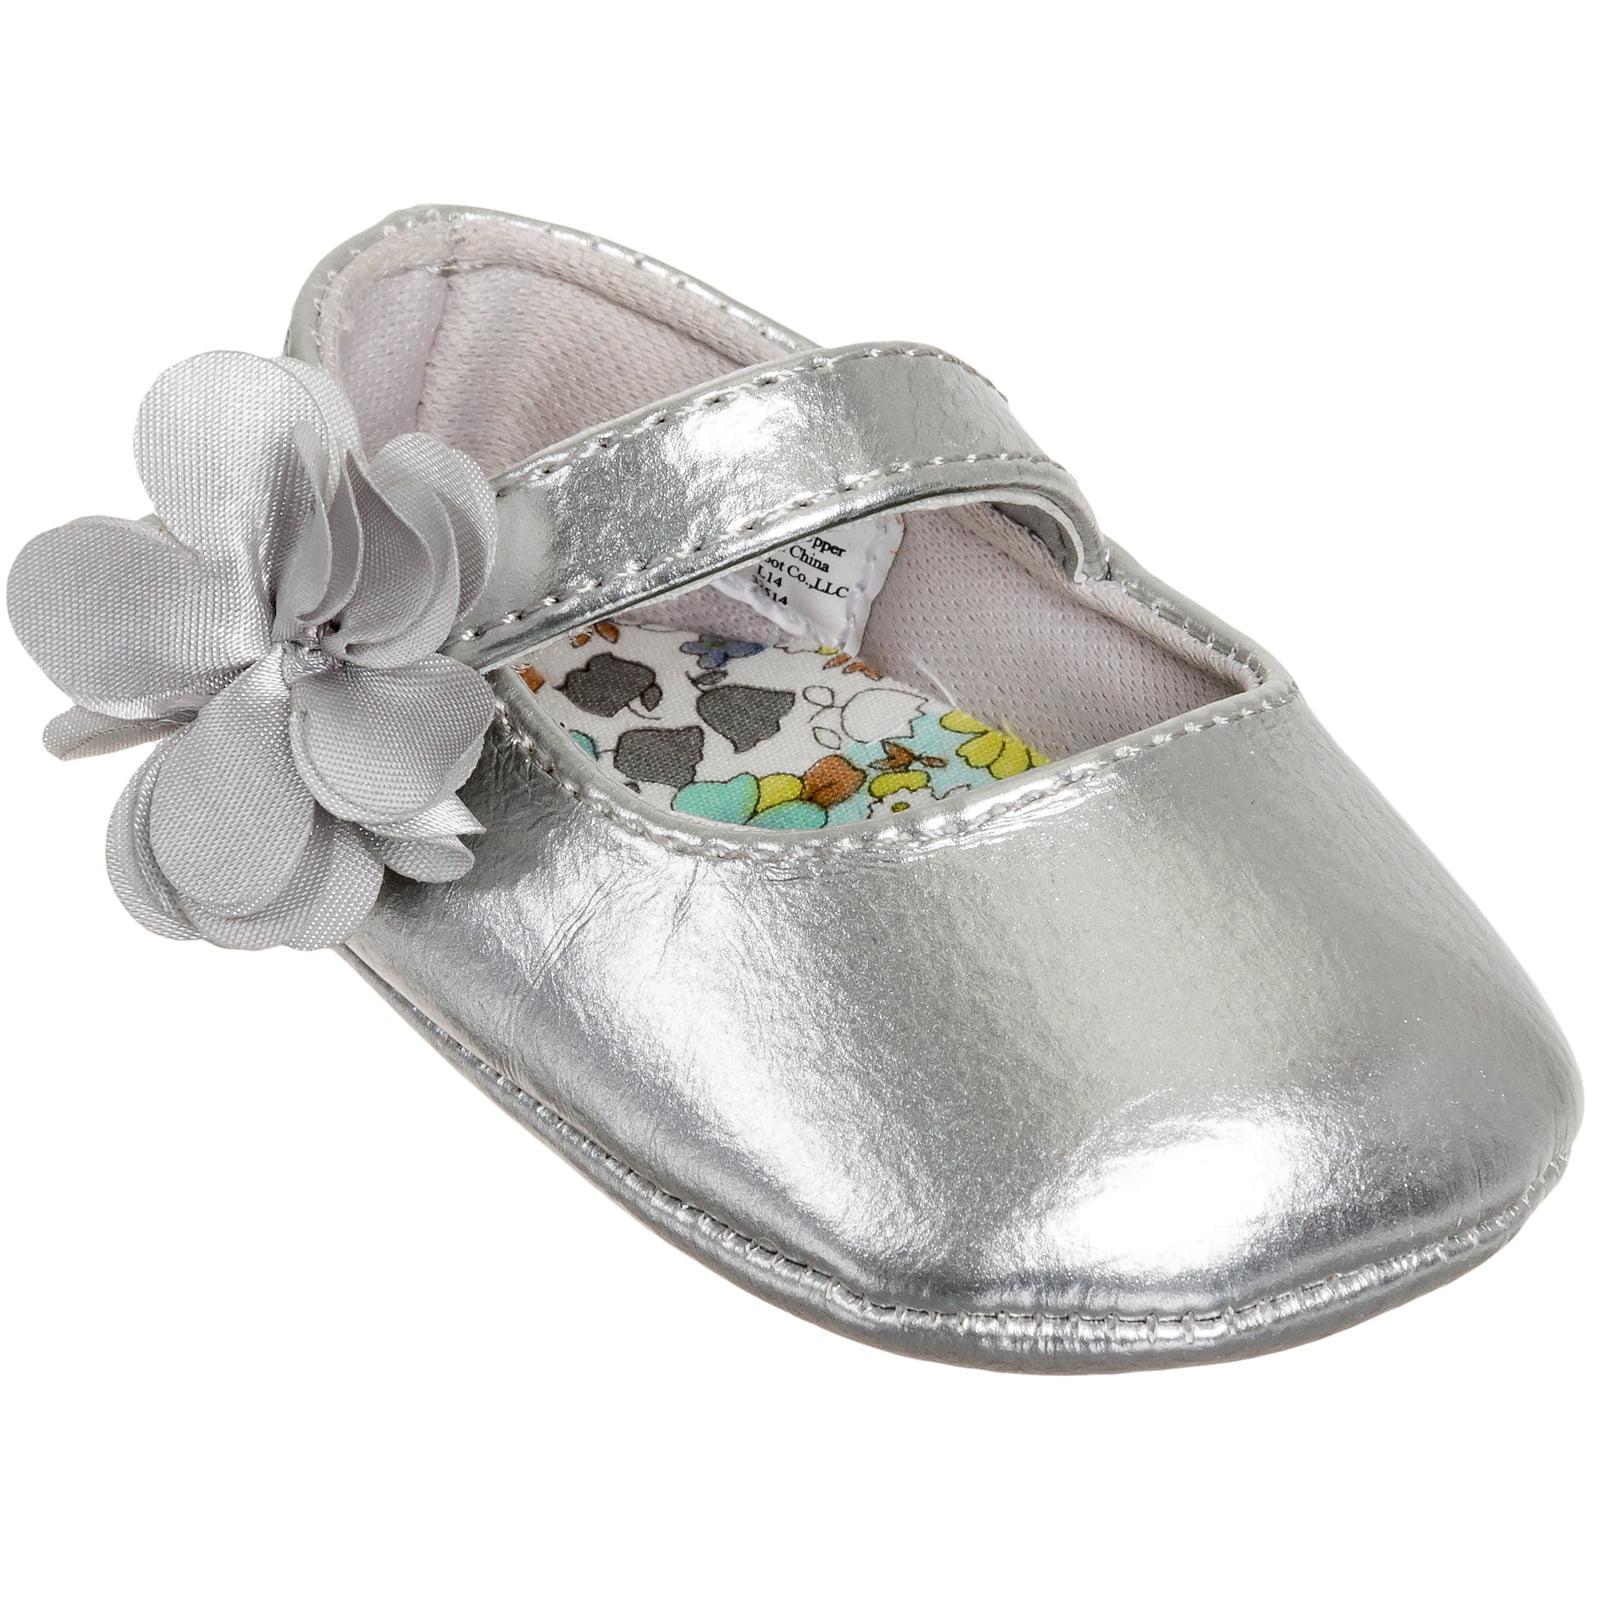 Baby Deer Girls Patent Skimmer Soft-Sole Ballet Flat Shoes (Silver, 1 US Infant)